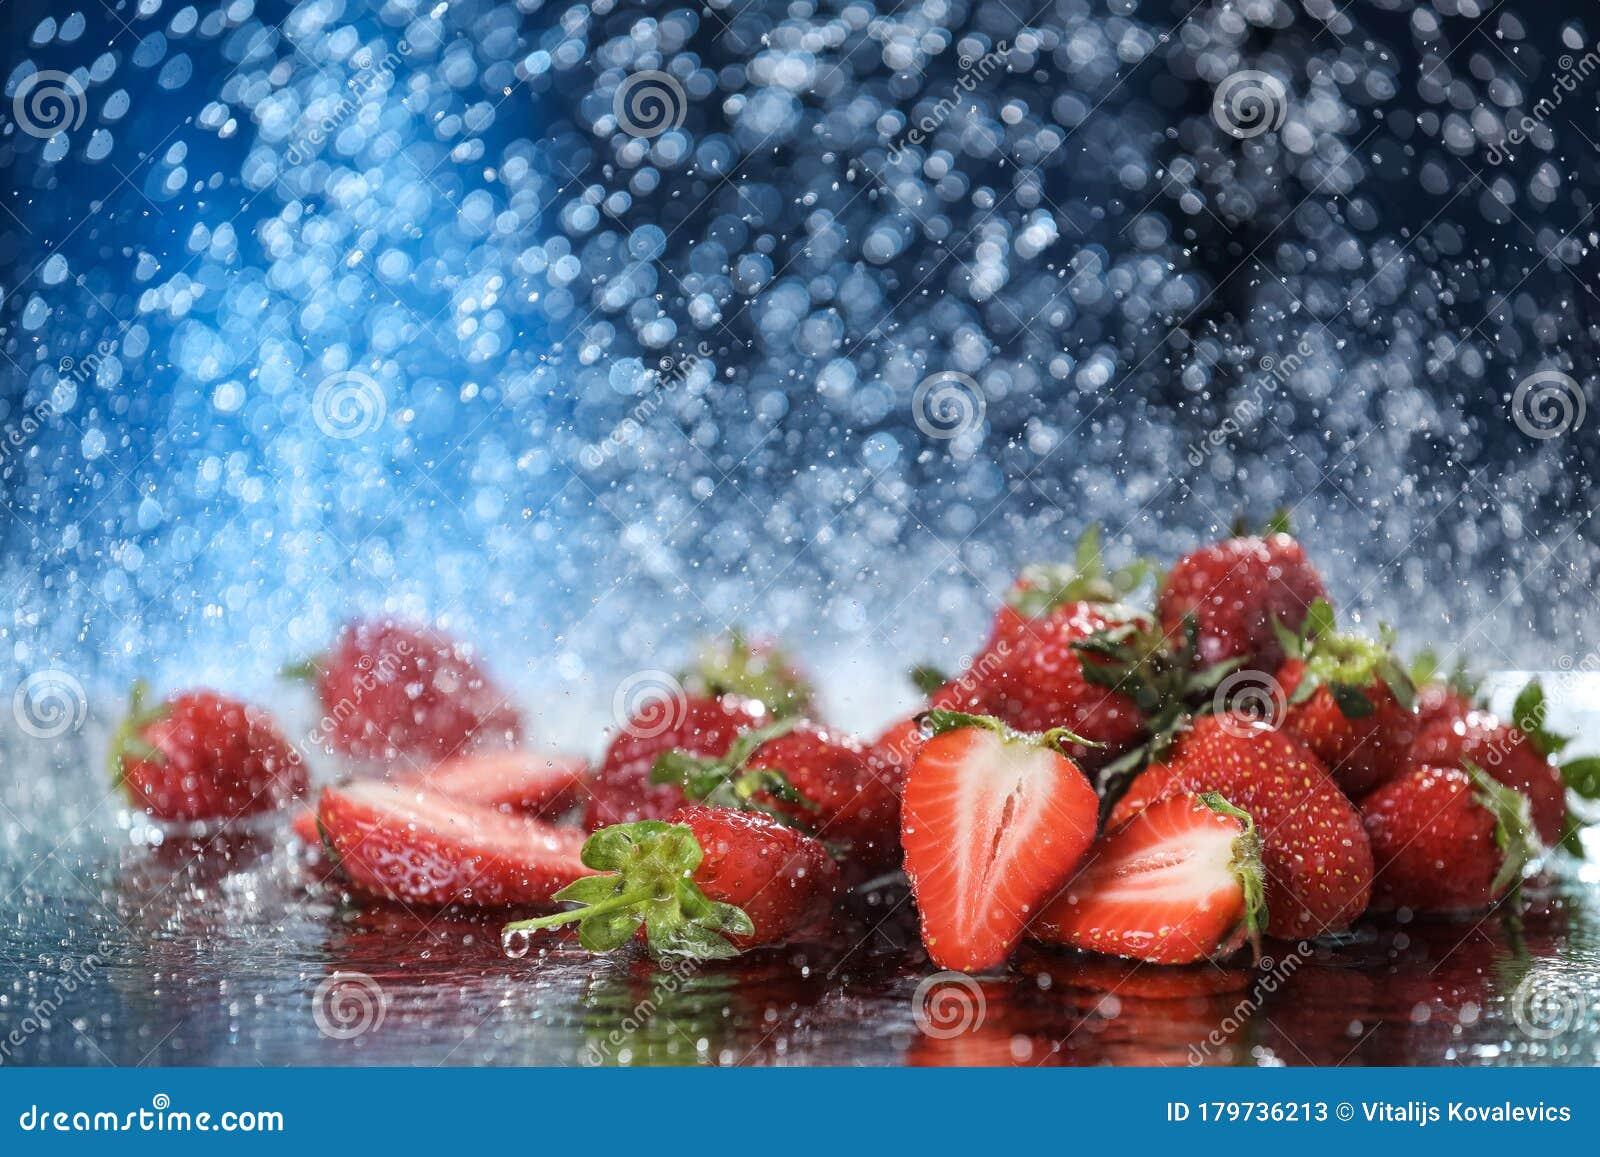 water and multivitamin diet